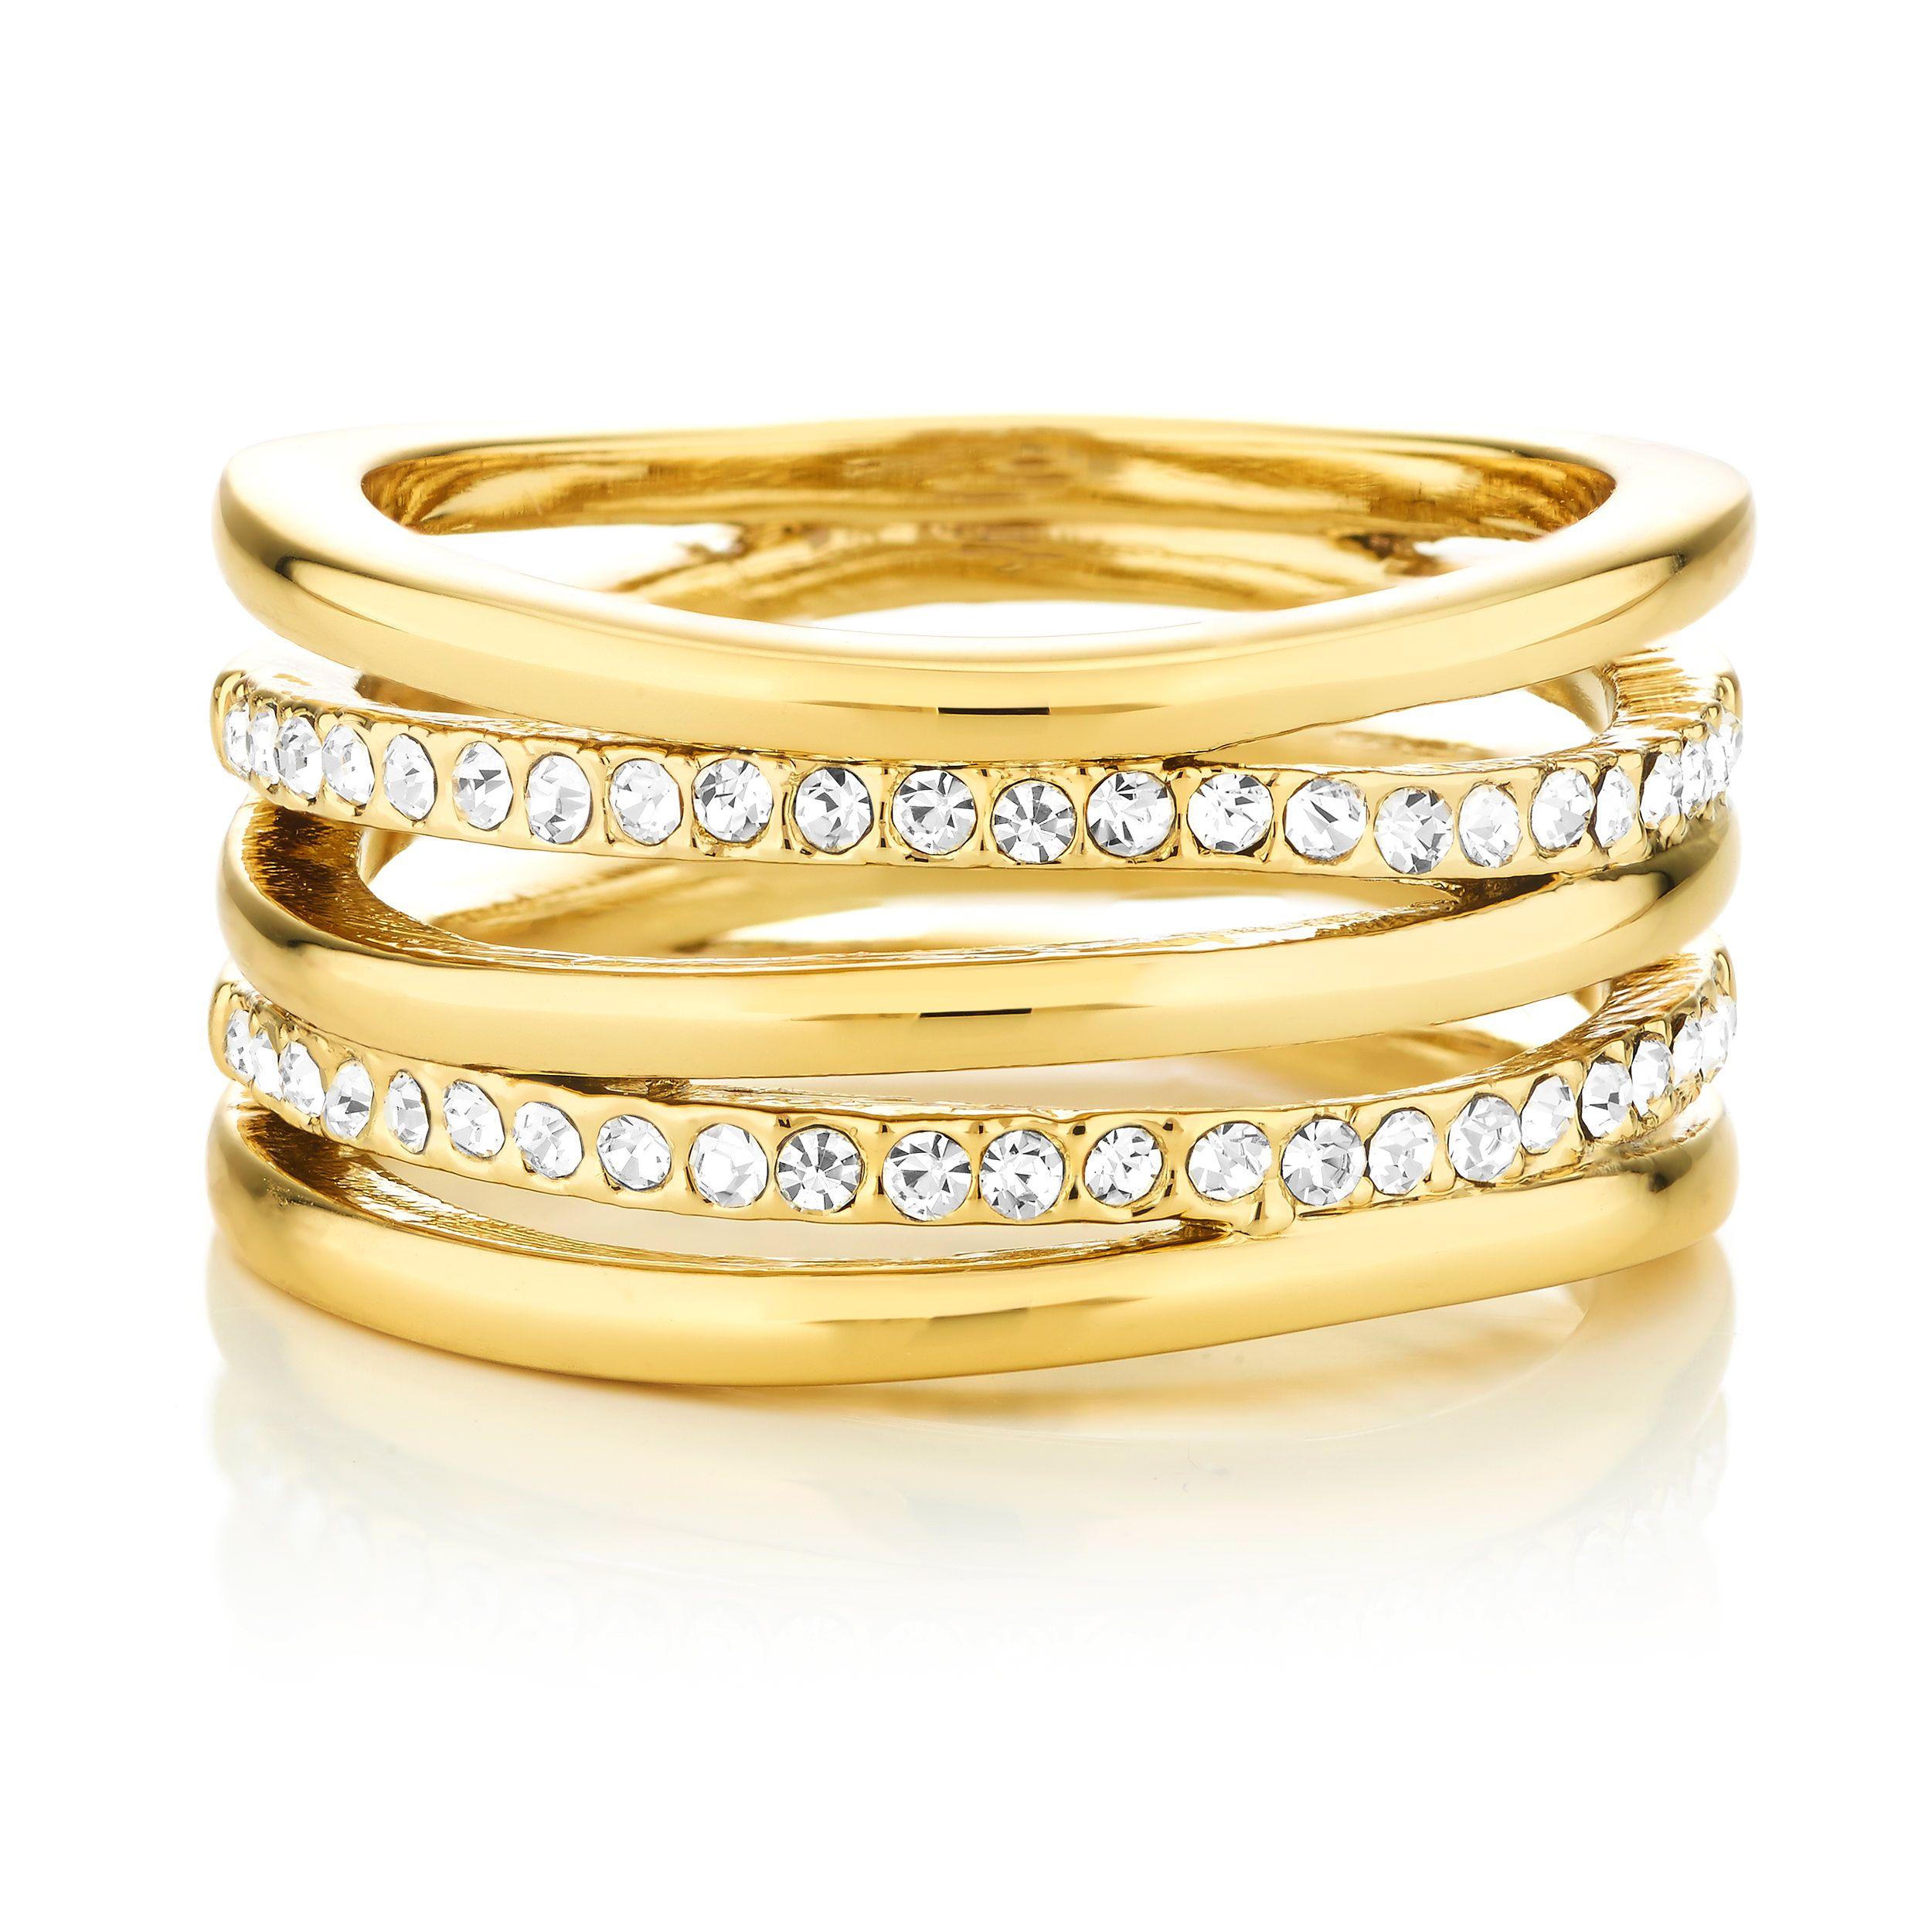 Buckley London Gold Ripple Ring